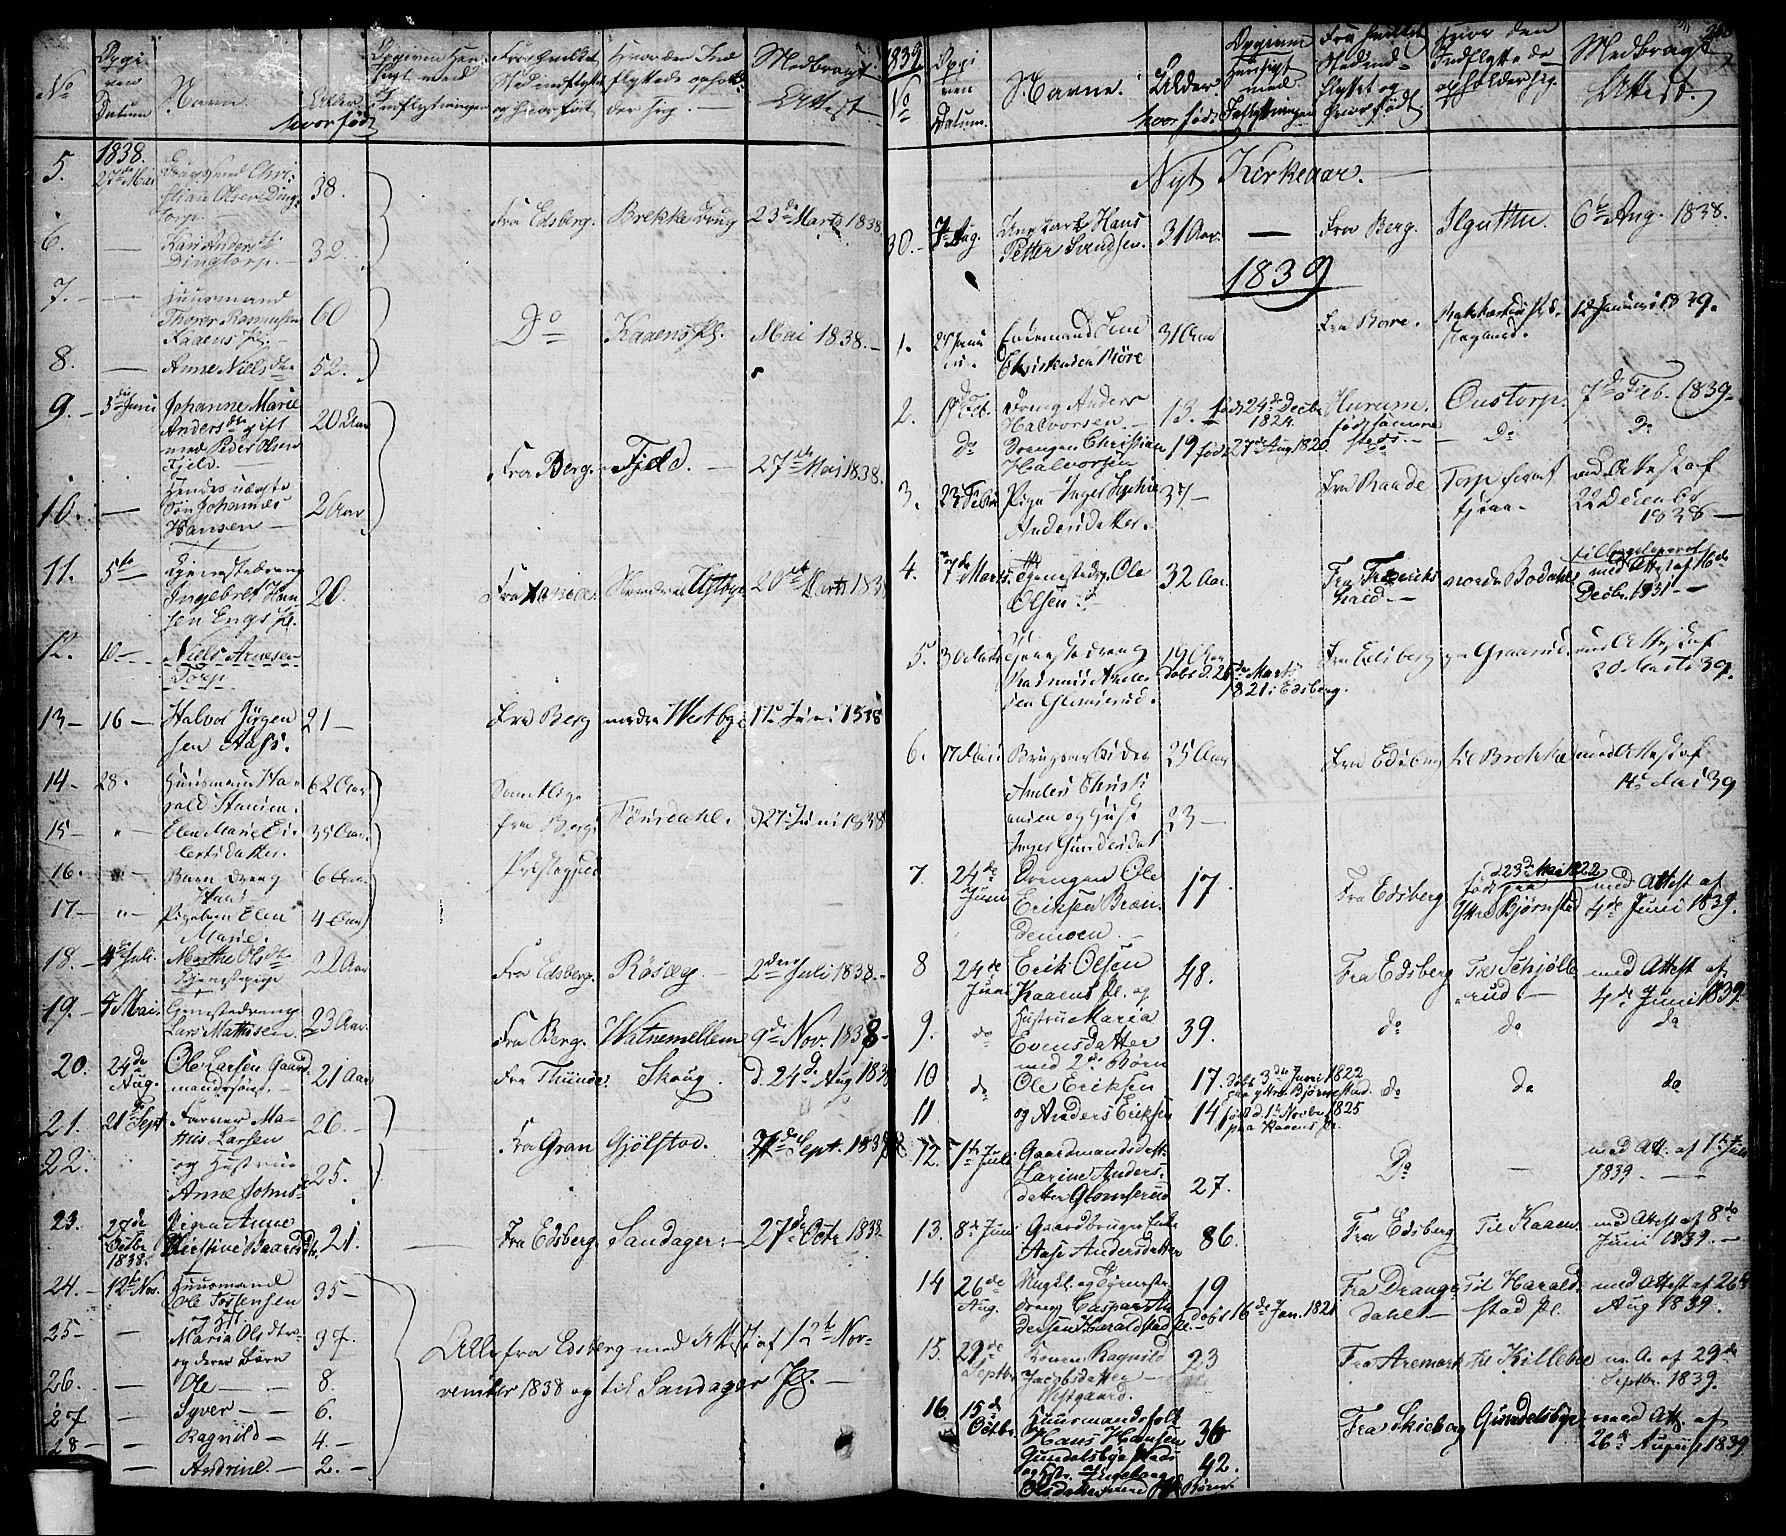 SAO, Rakkestad prestekontor Kirkebøker, F/Fa/L0007: Ministerialbok nr. I 7, 1825-1841, s. 258